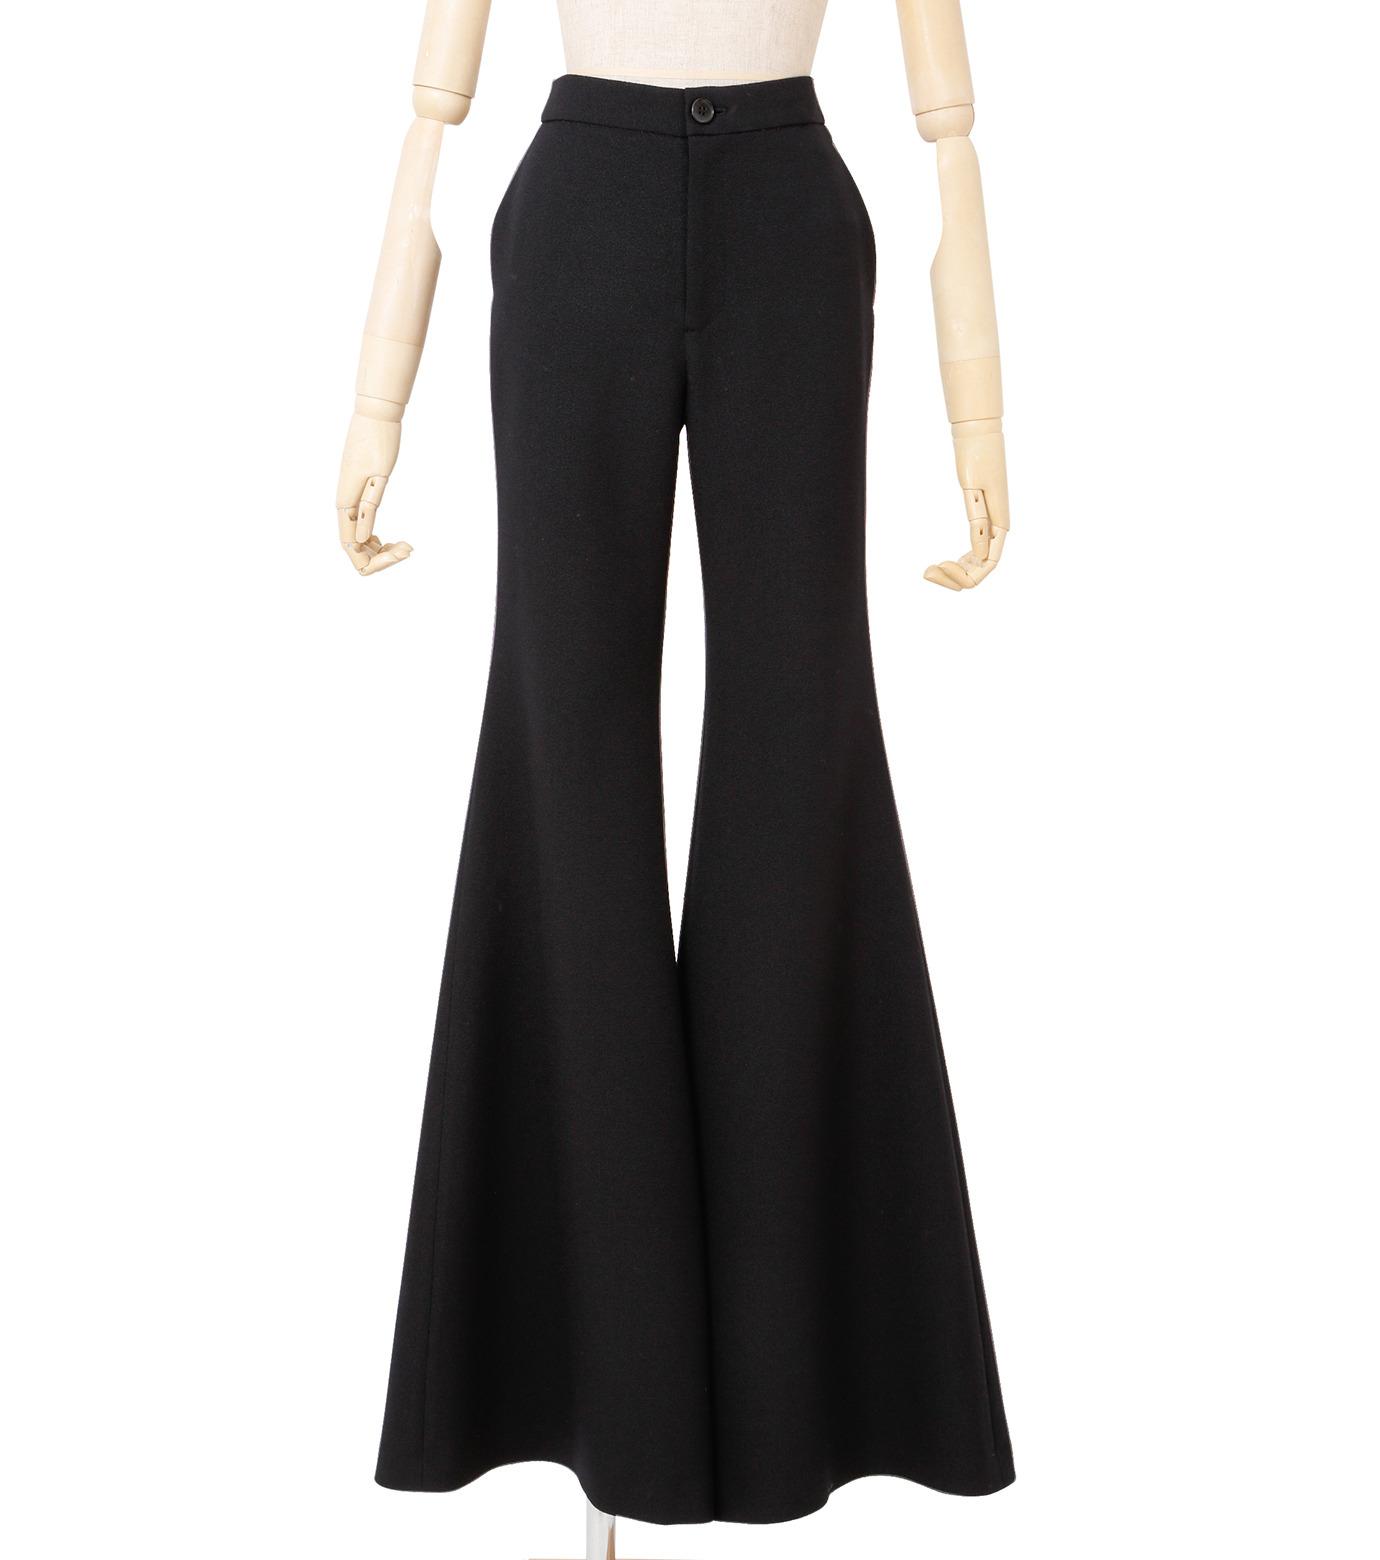 IRENE(アイレネ)のトランペットトラウザー-BLACK(パンツ/pants)-18A88002 拡大詳細画像1